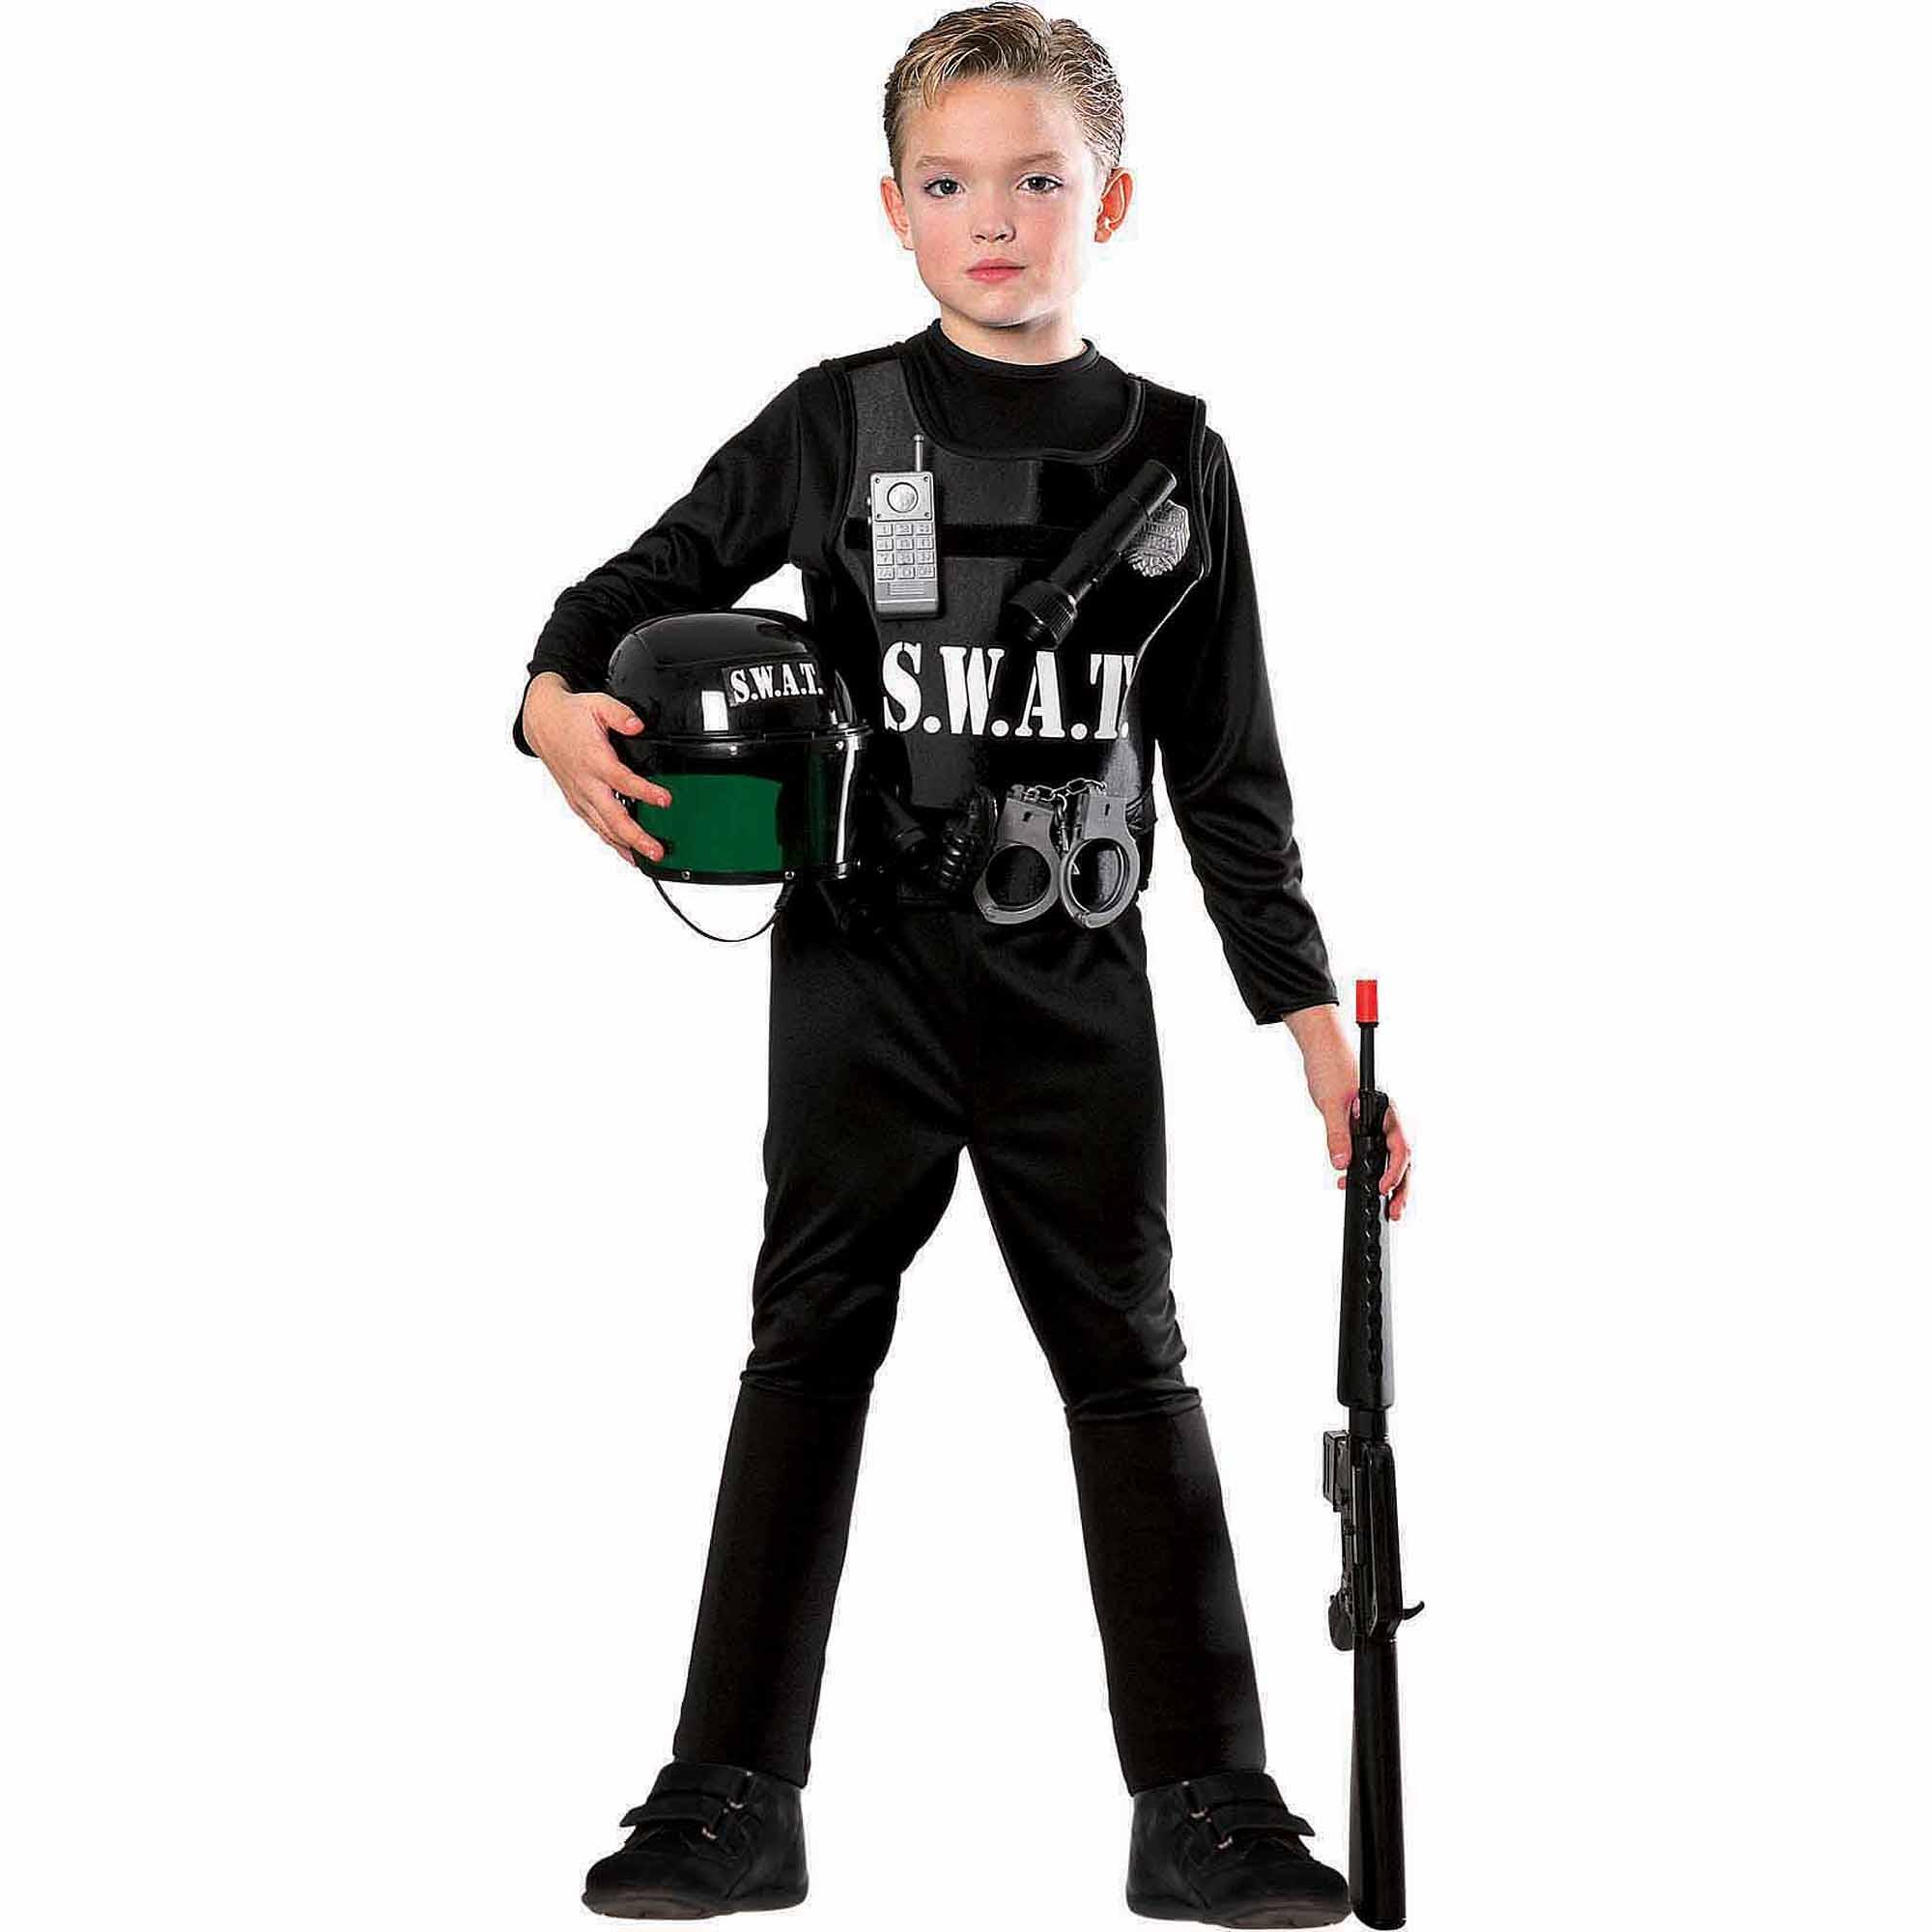 S.W.A.T. Team Child Halloween Costume